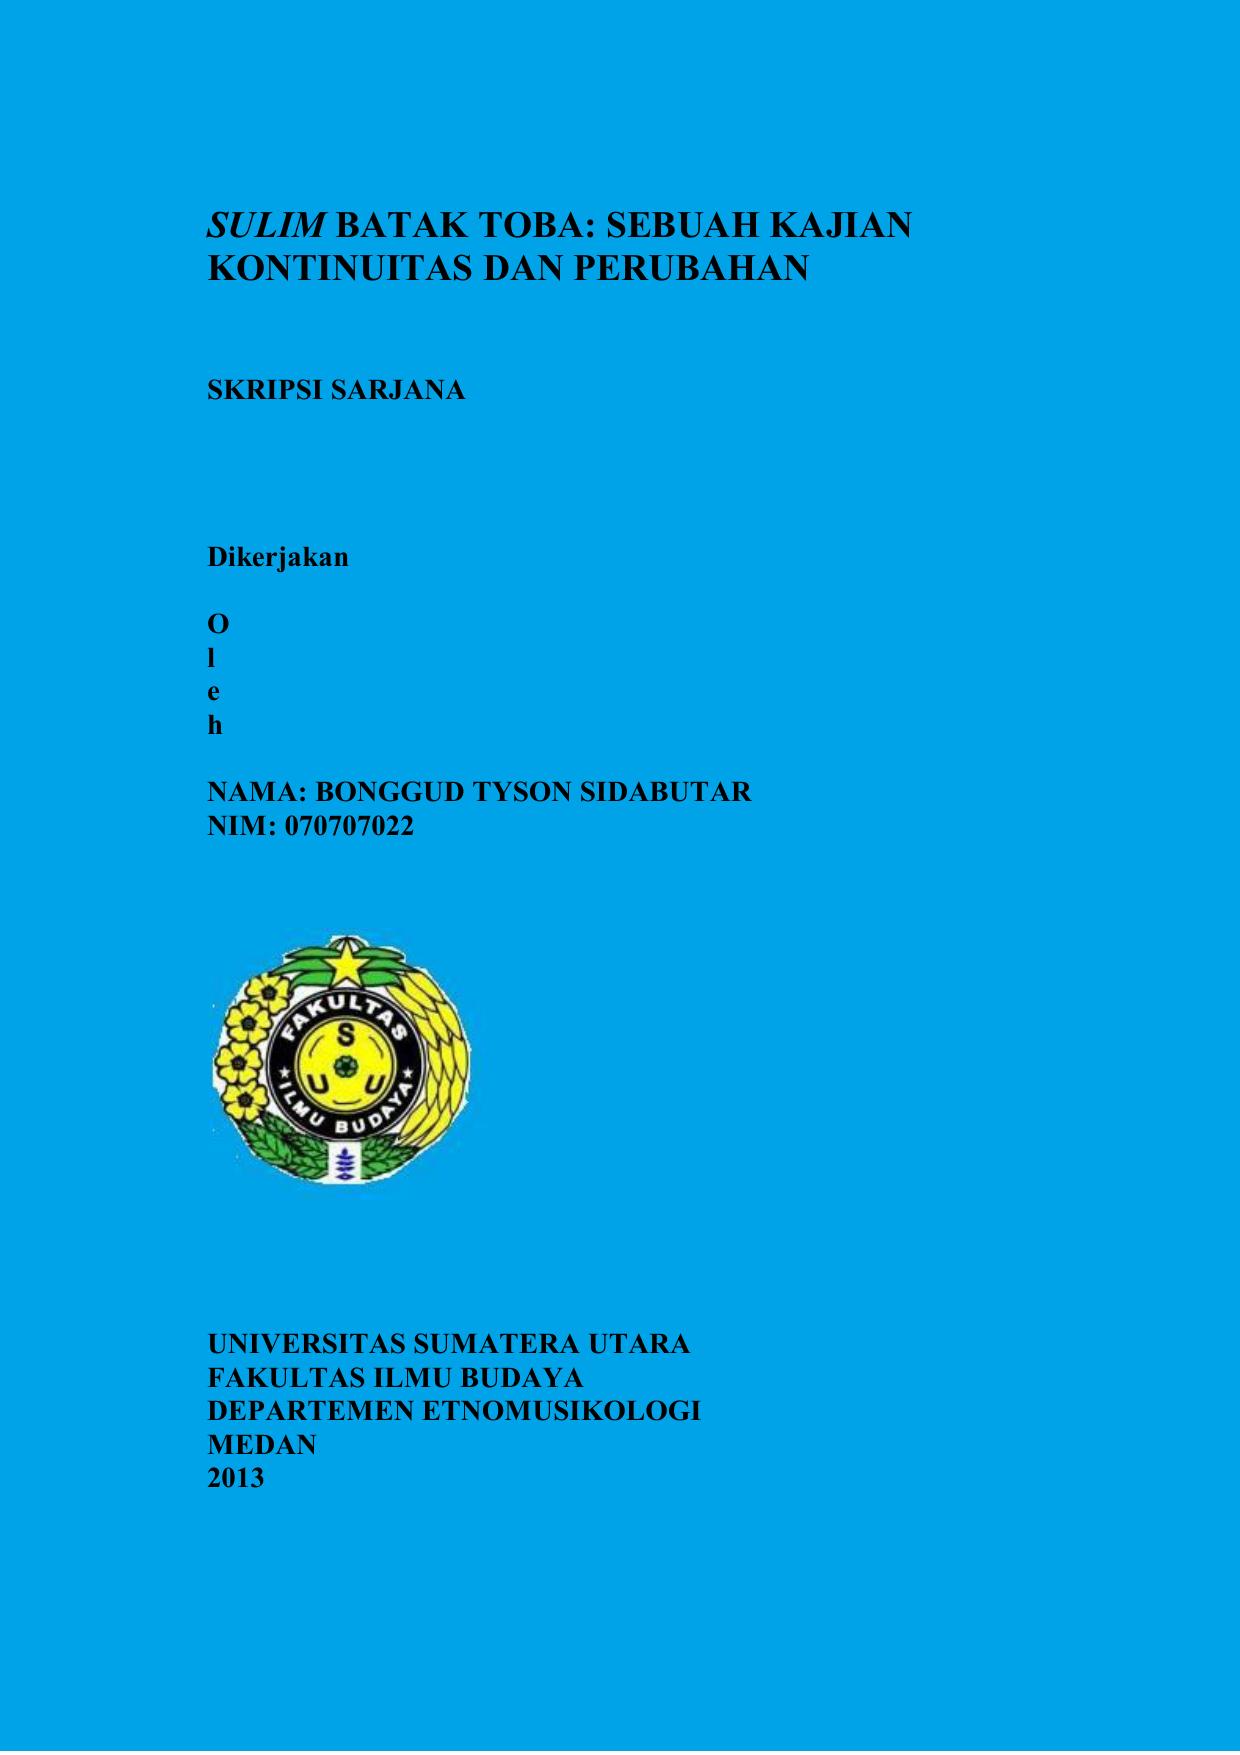 Sulim Batak Toba Program Studi Etnomusikologi Usu